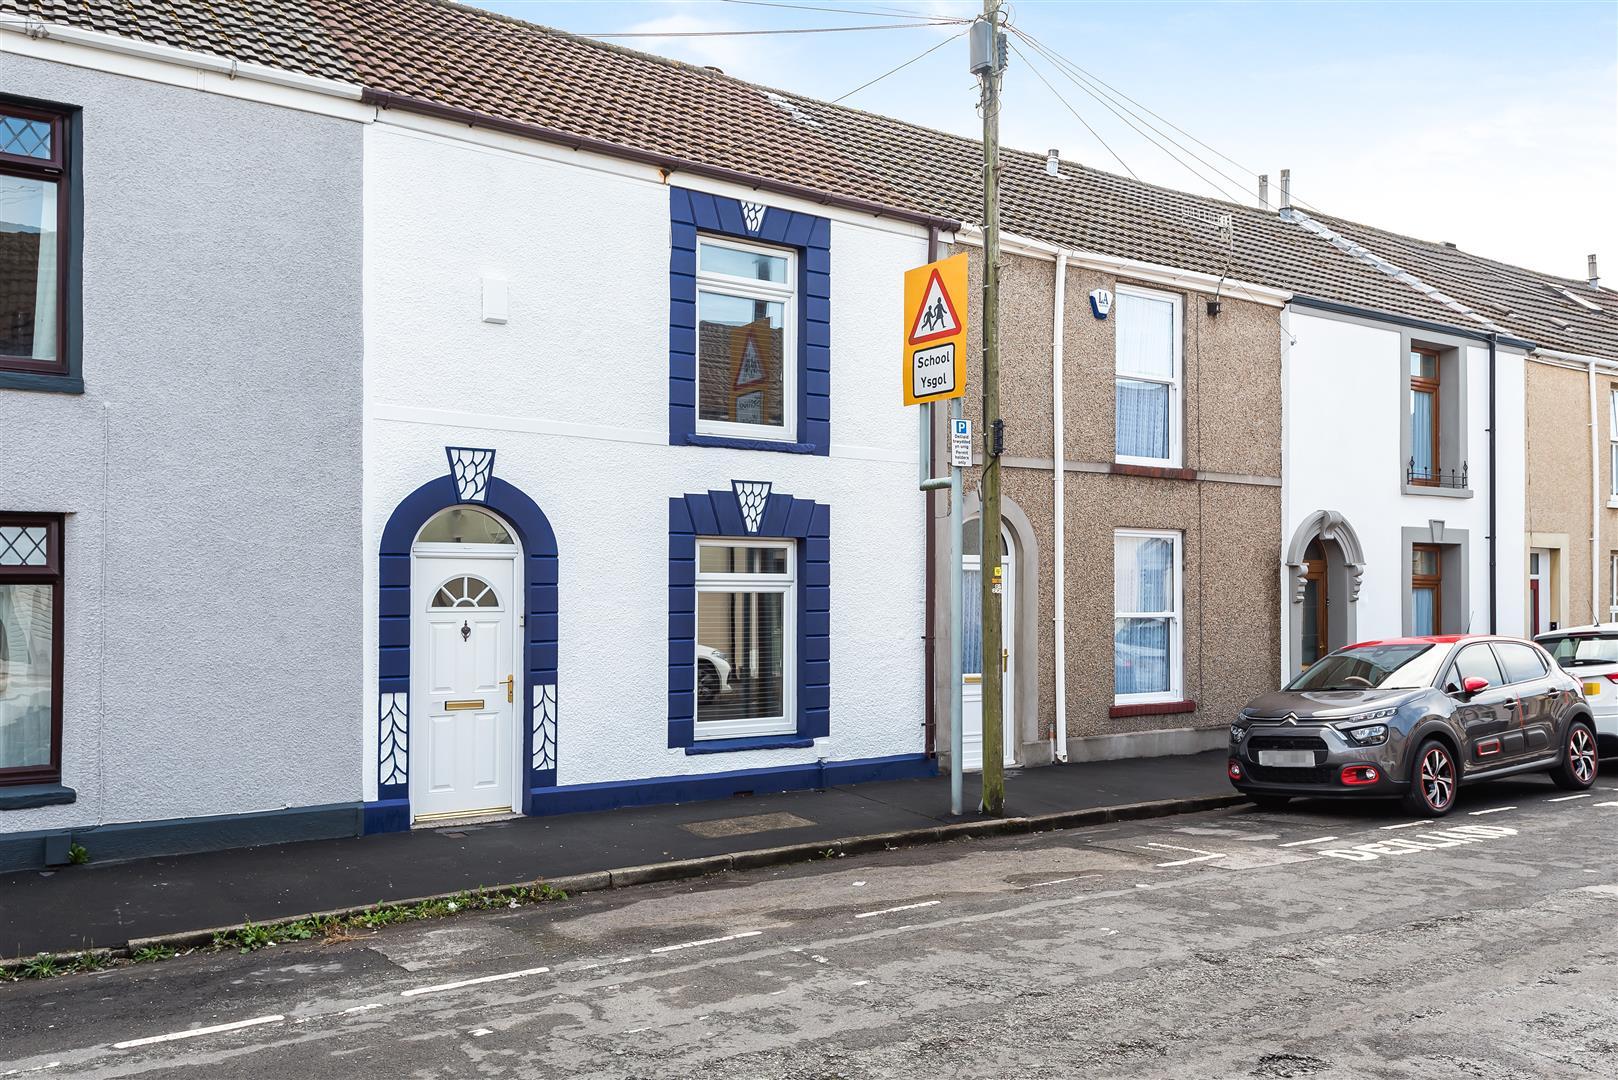 Rodney Street, Sandfields Swansea, SA1 3UB